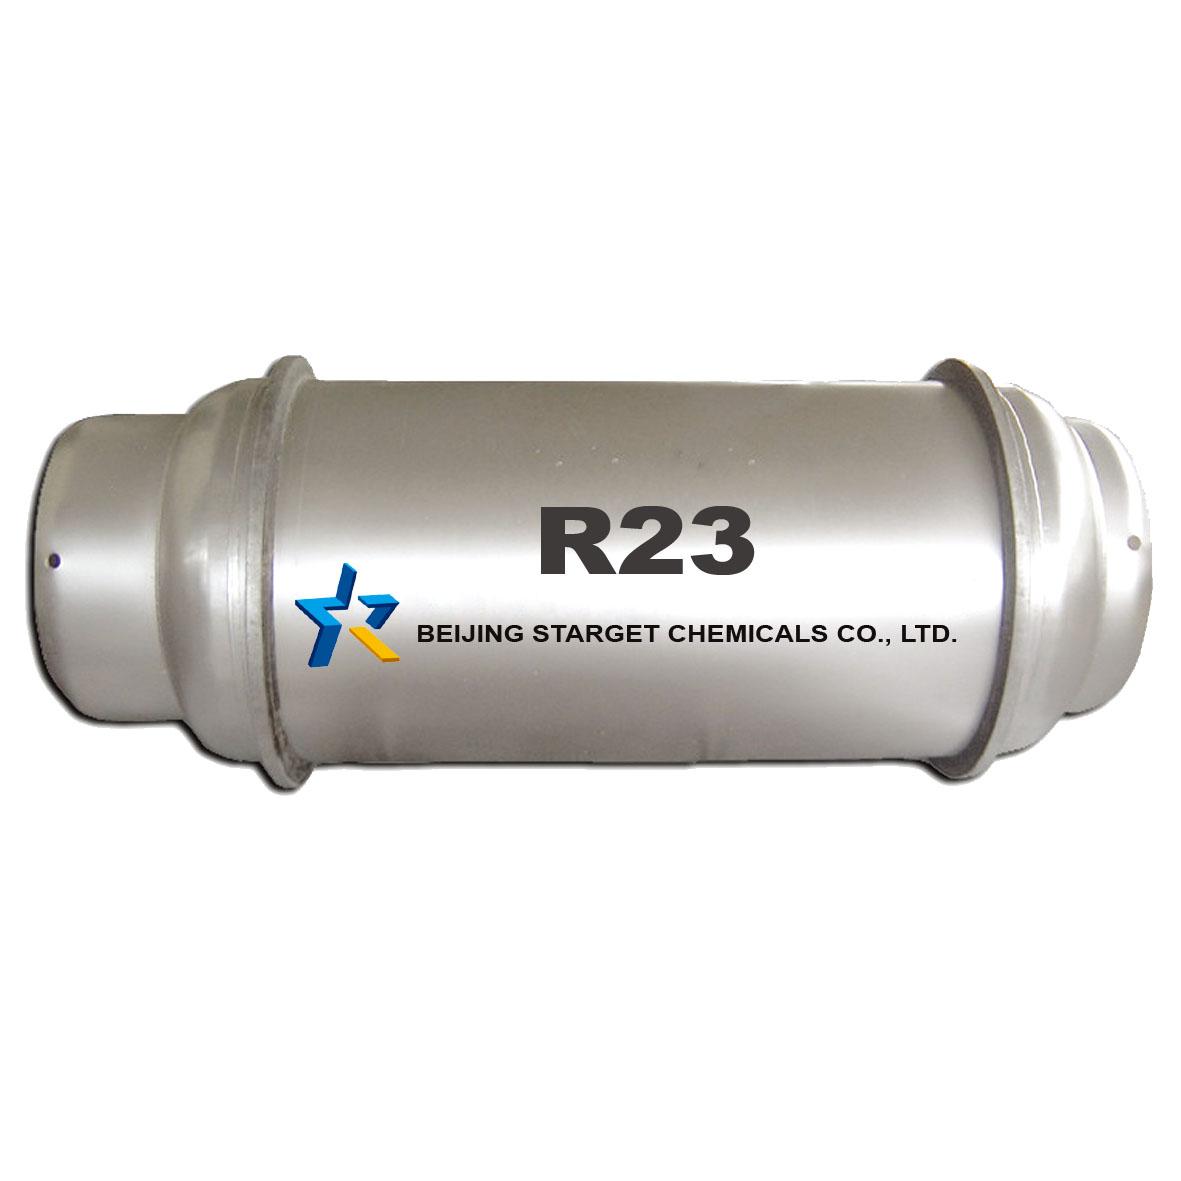 Refrigerant R23